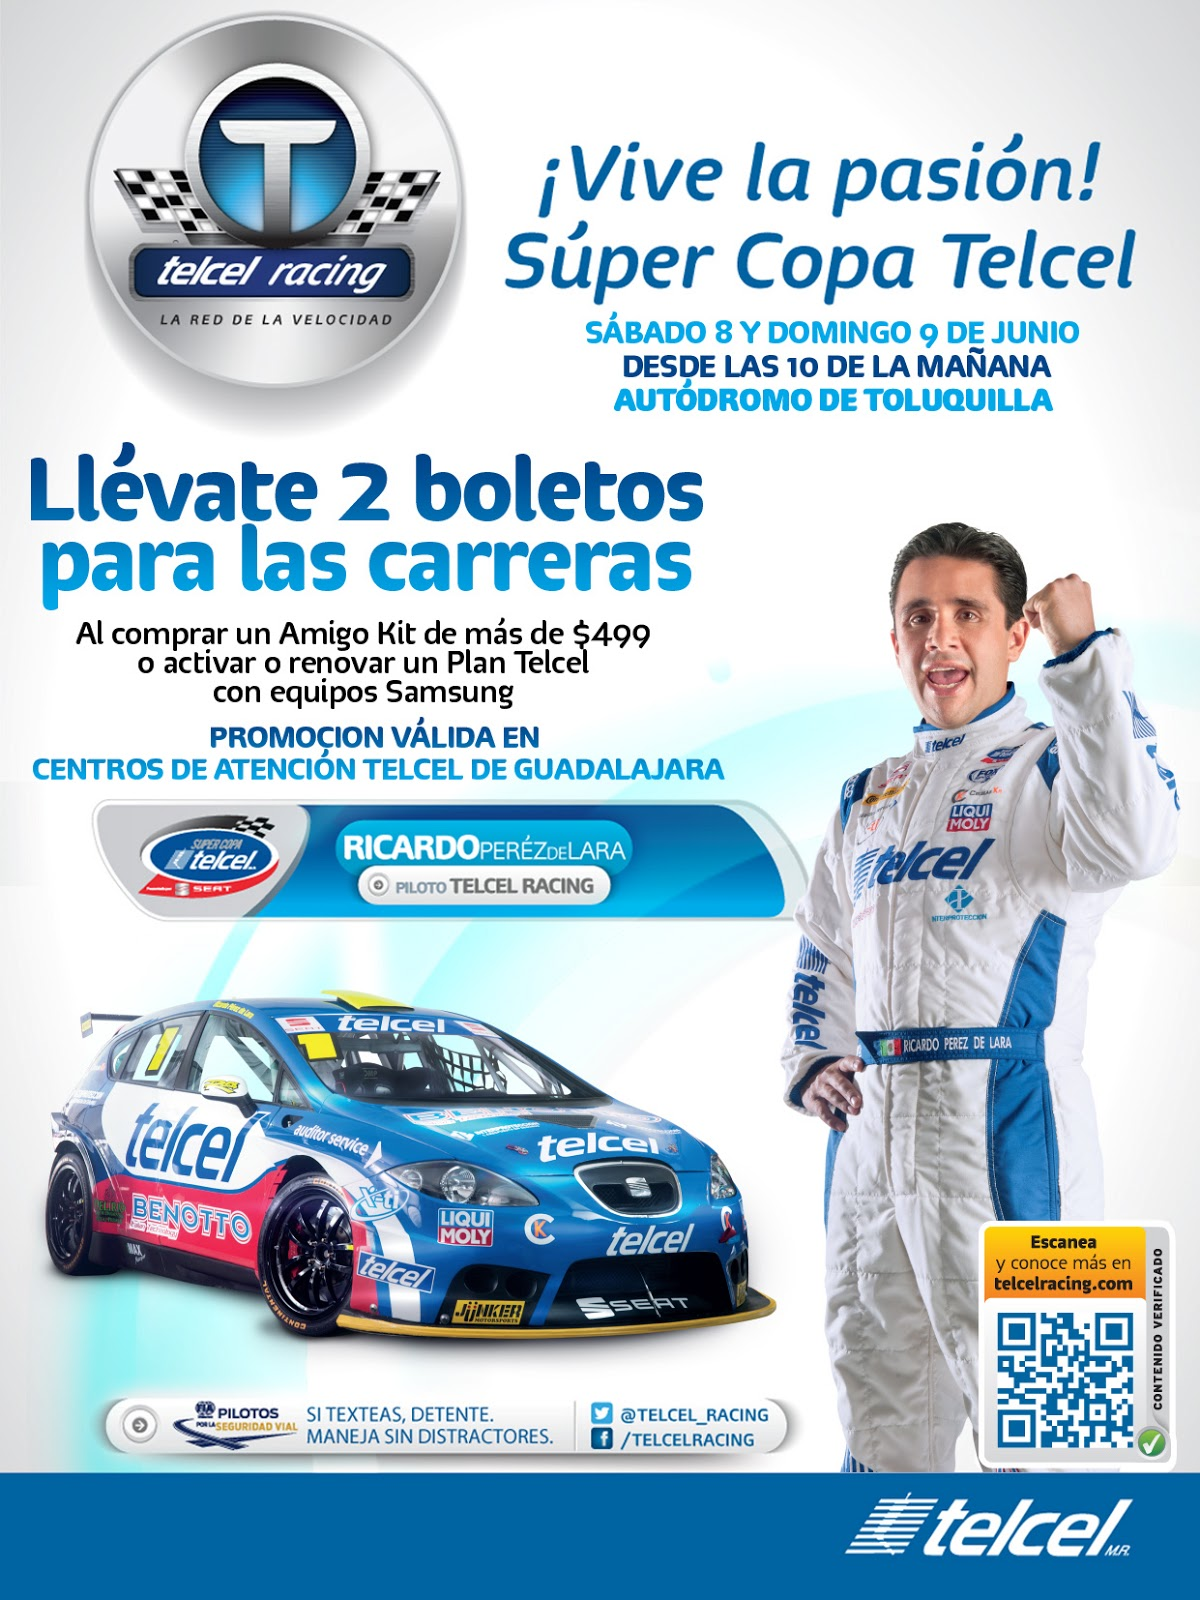 Global publicidad super copa telcel boletos gratis for Super copo